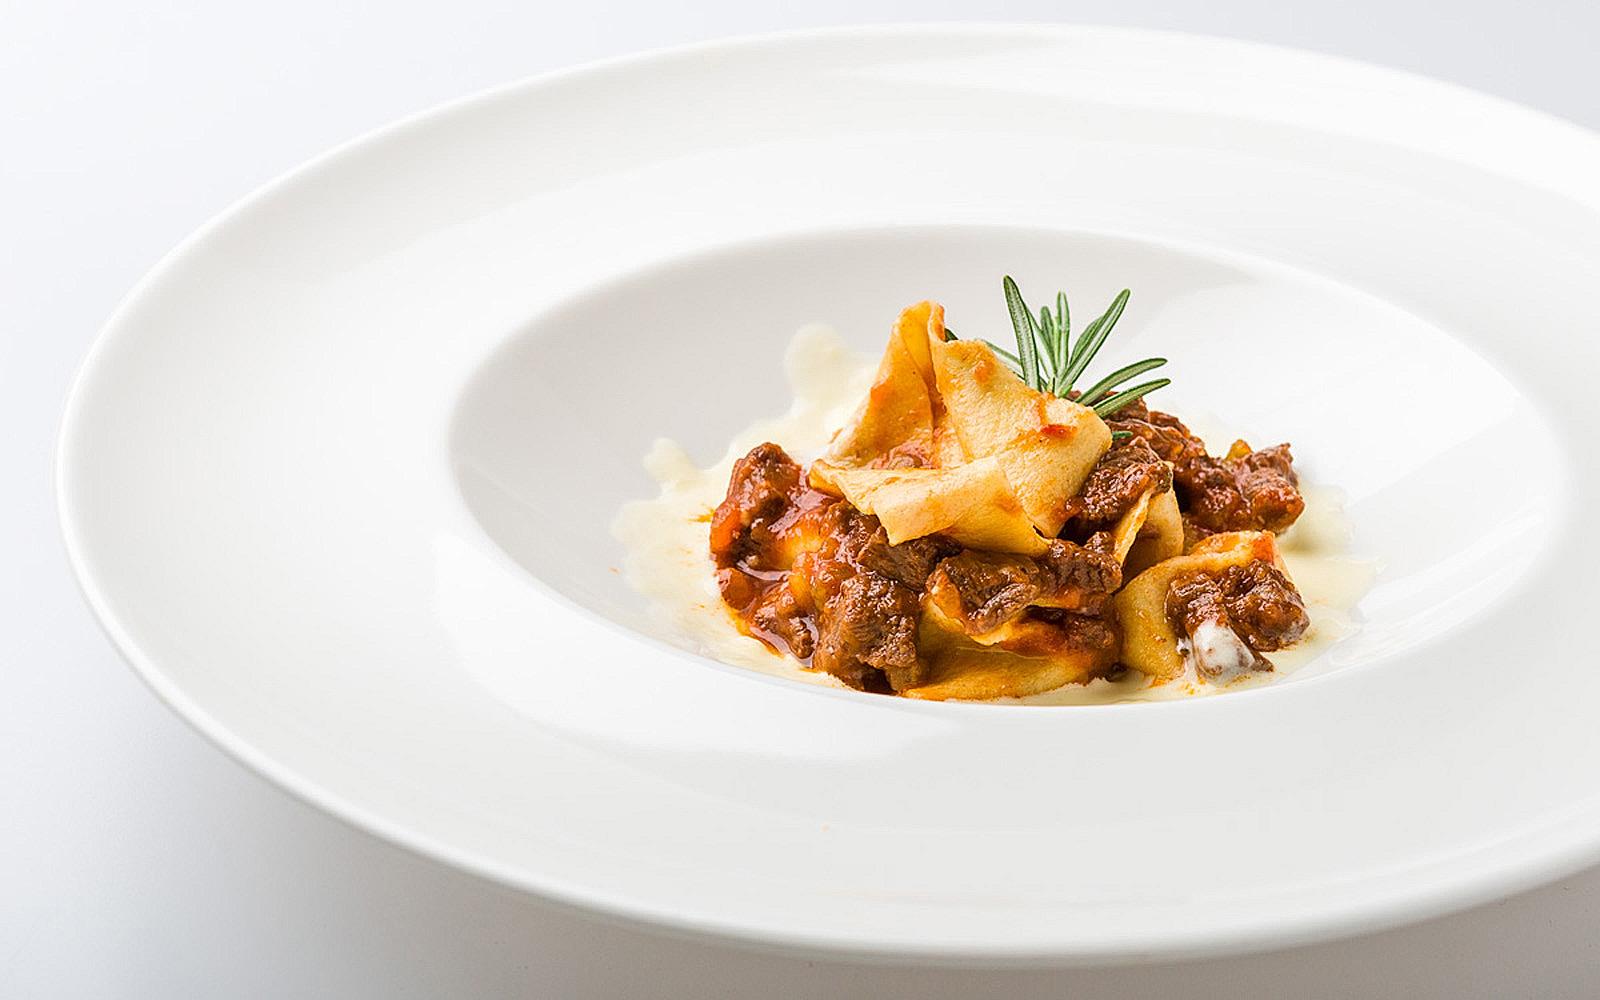 Osteria Award Winning Italian Restaurant, North Berwick, East Lothian